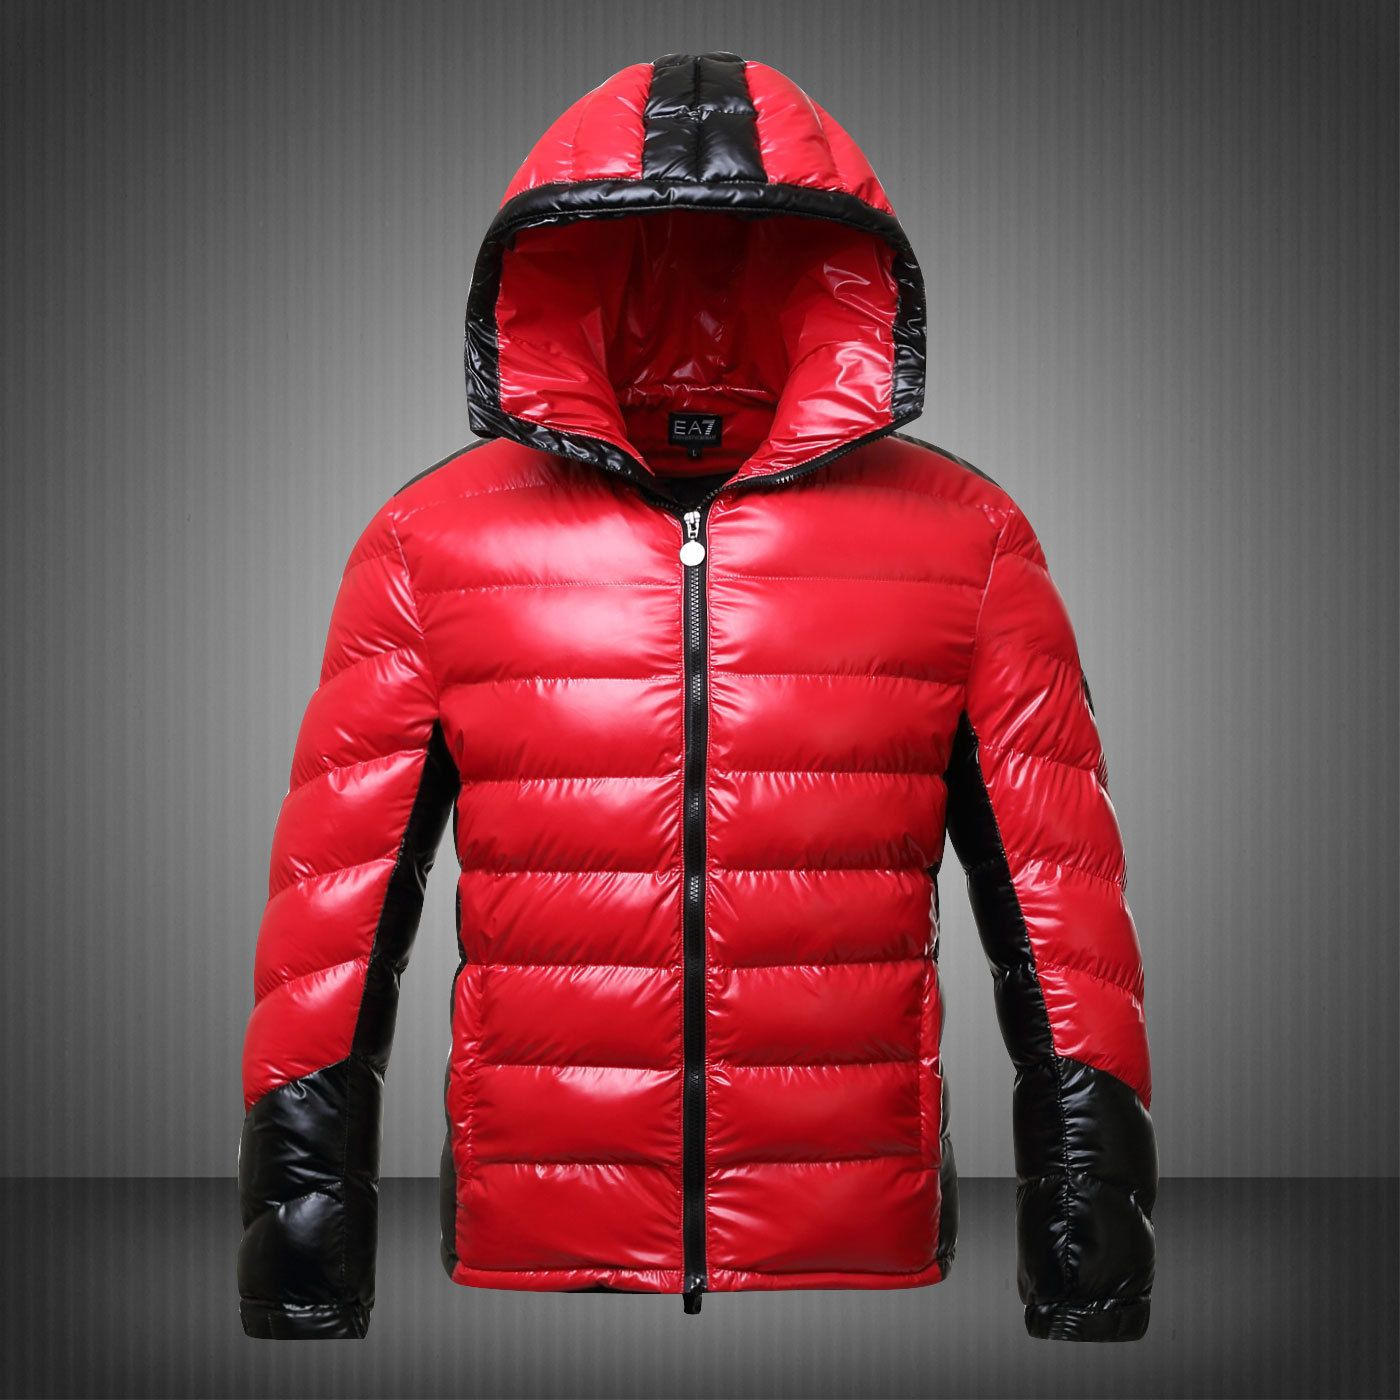 c0e830b93f Armani Ea7 down jacket | Men's Fashion Clothings | Shirt sale, Mens ...